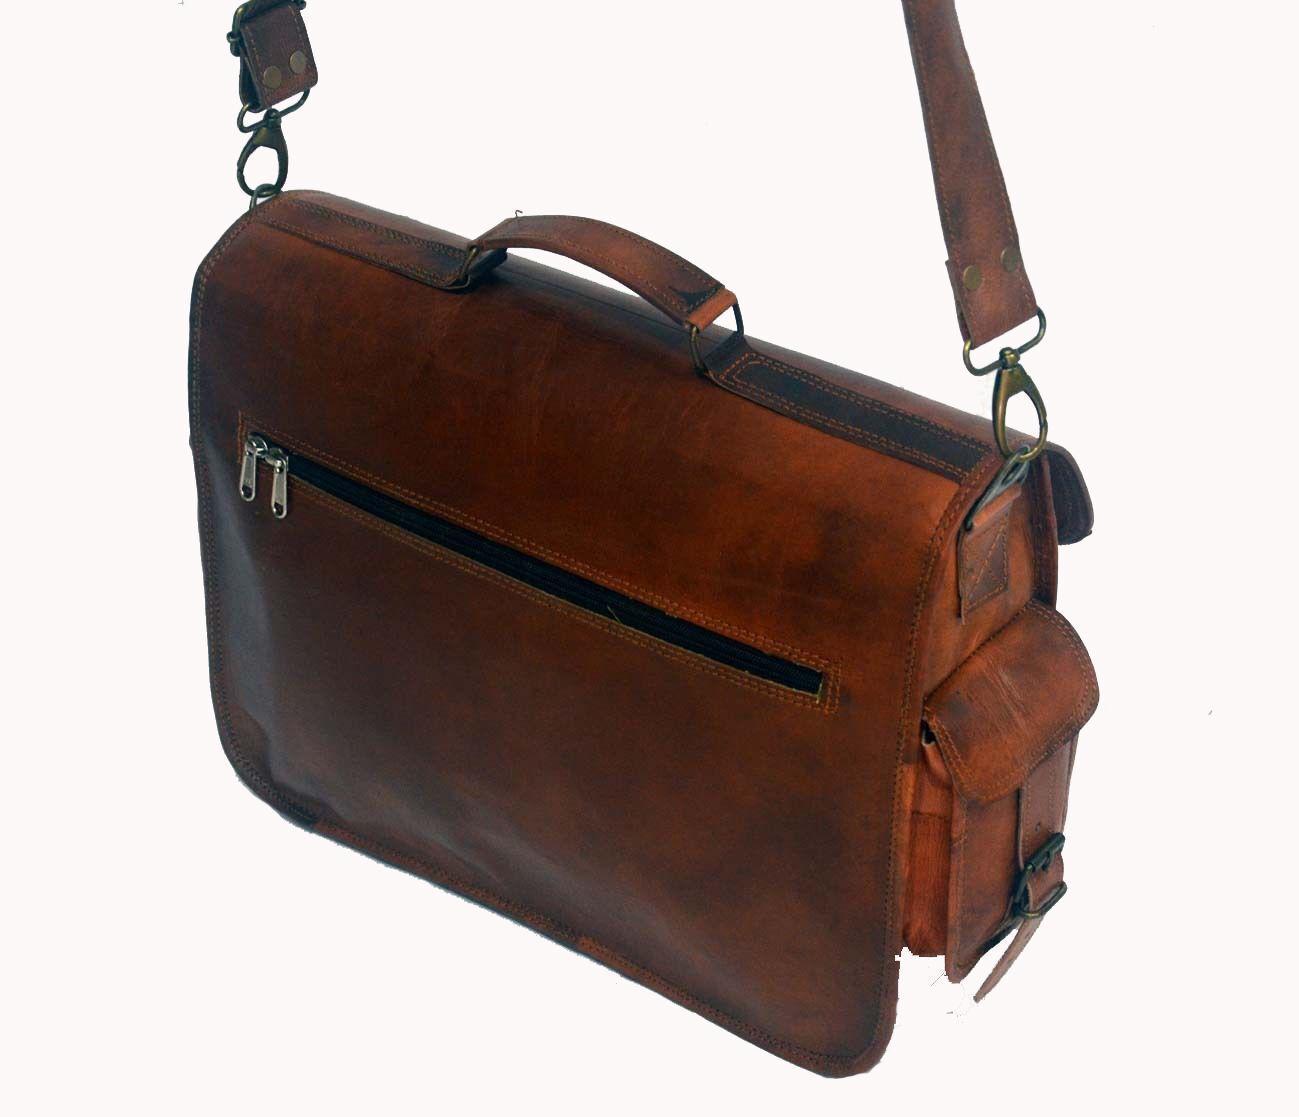 Neuer echtes Leder Vintage Messenger Business Business Business Mann Laptop Satche Aktentasche   Outlet Store Online  639bbf